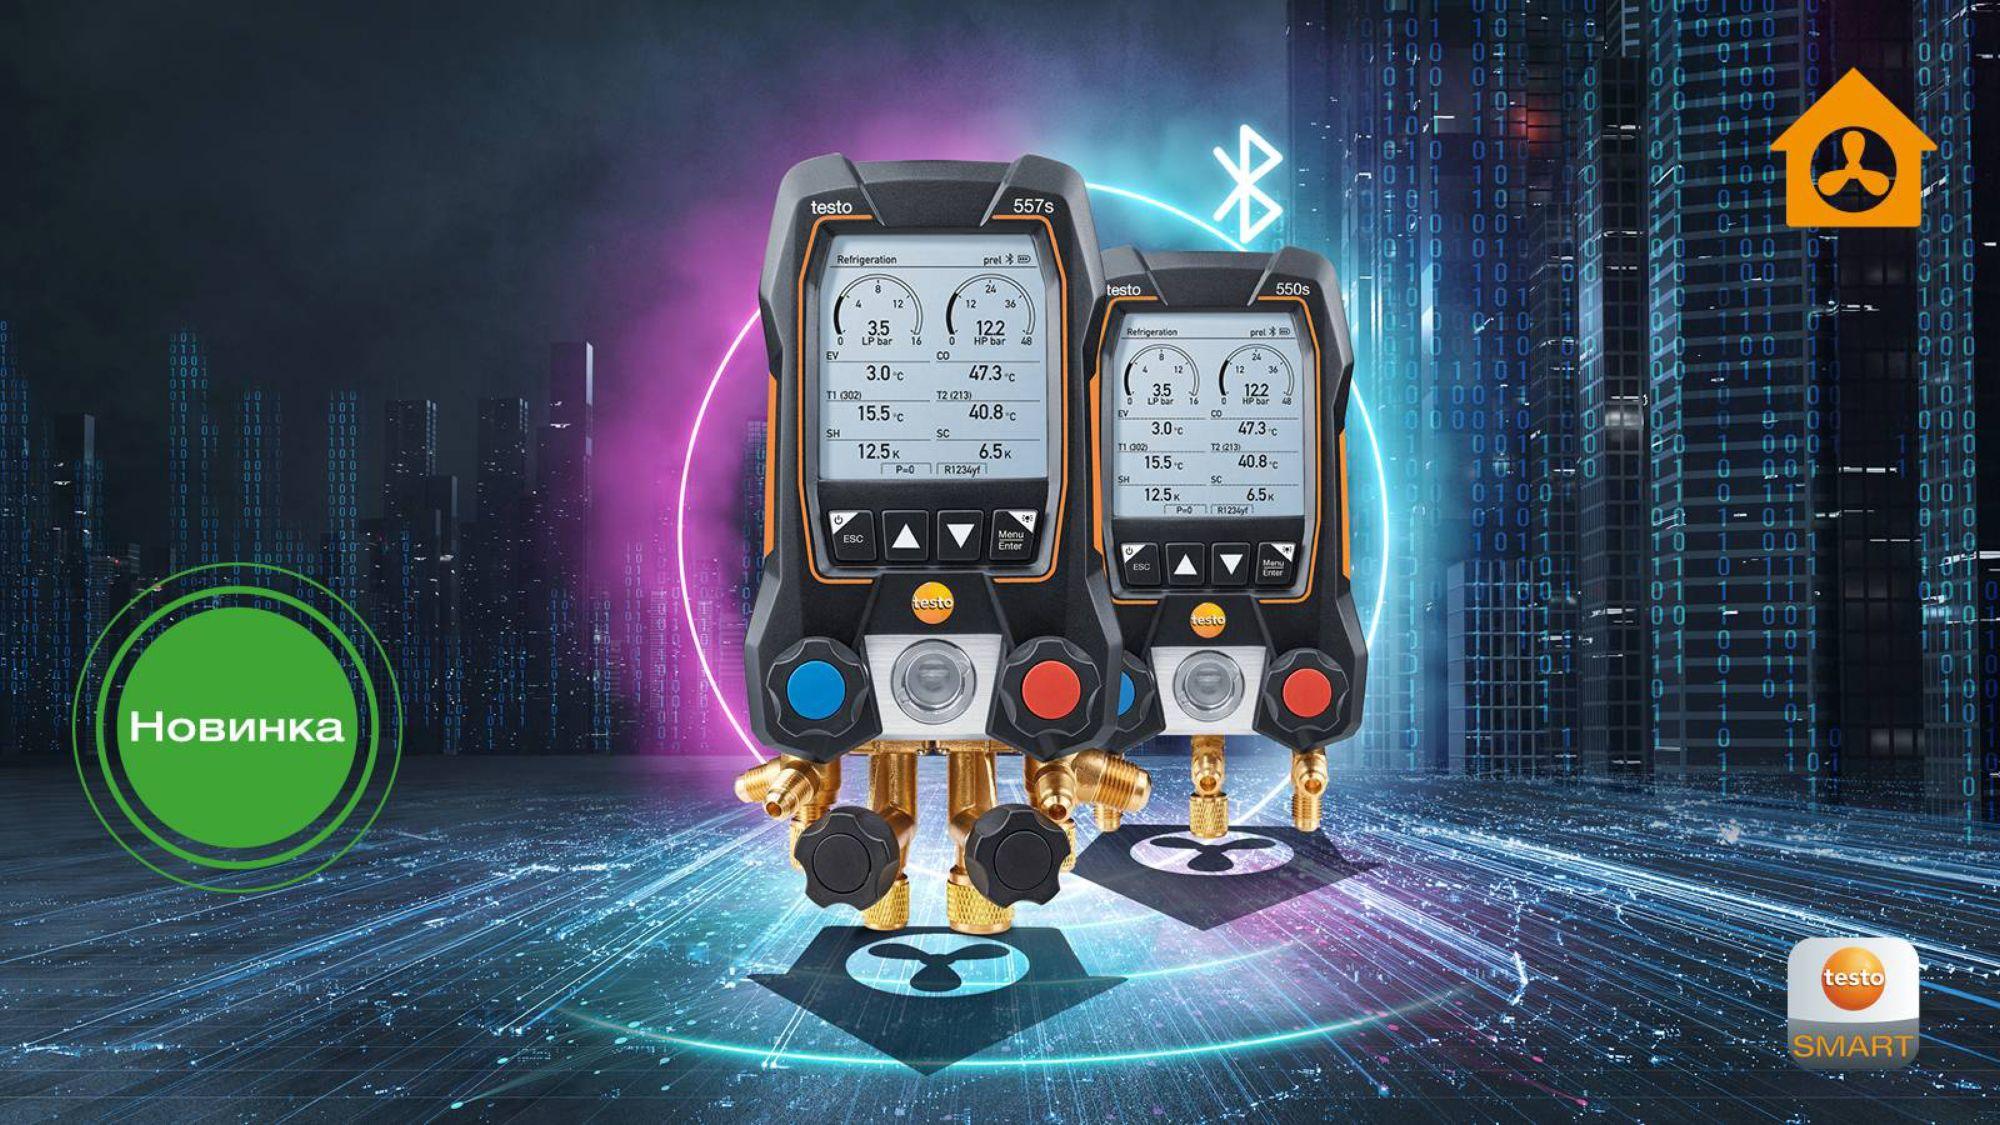 Цифровые манометрические коллекторы testo 557s и testo 550s